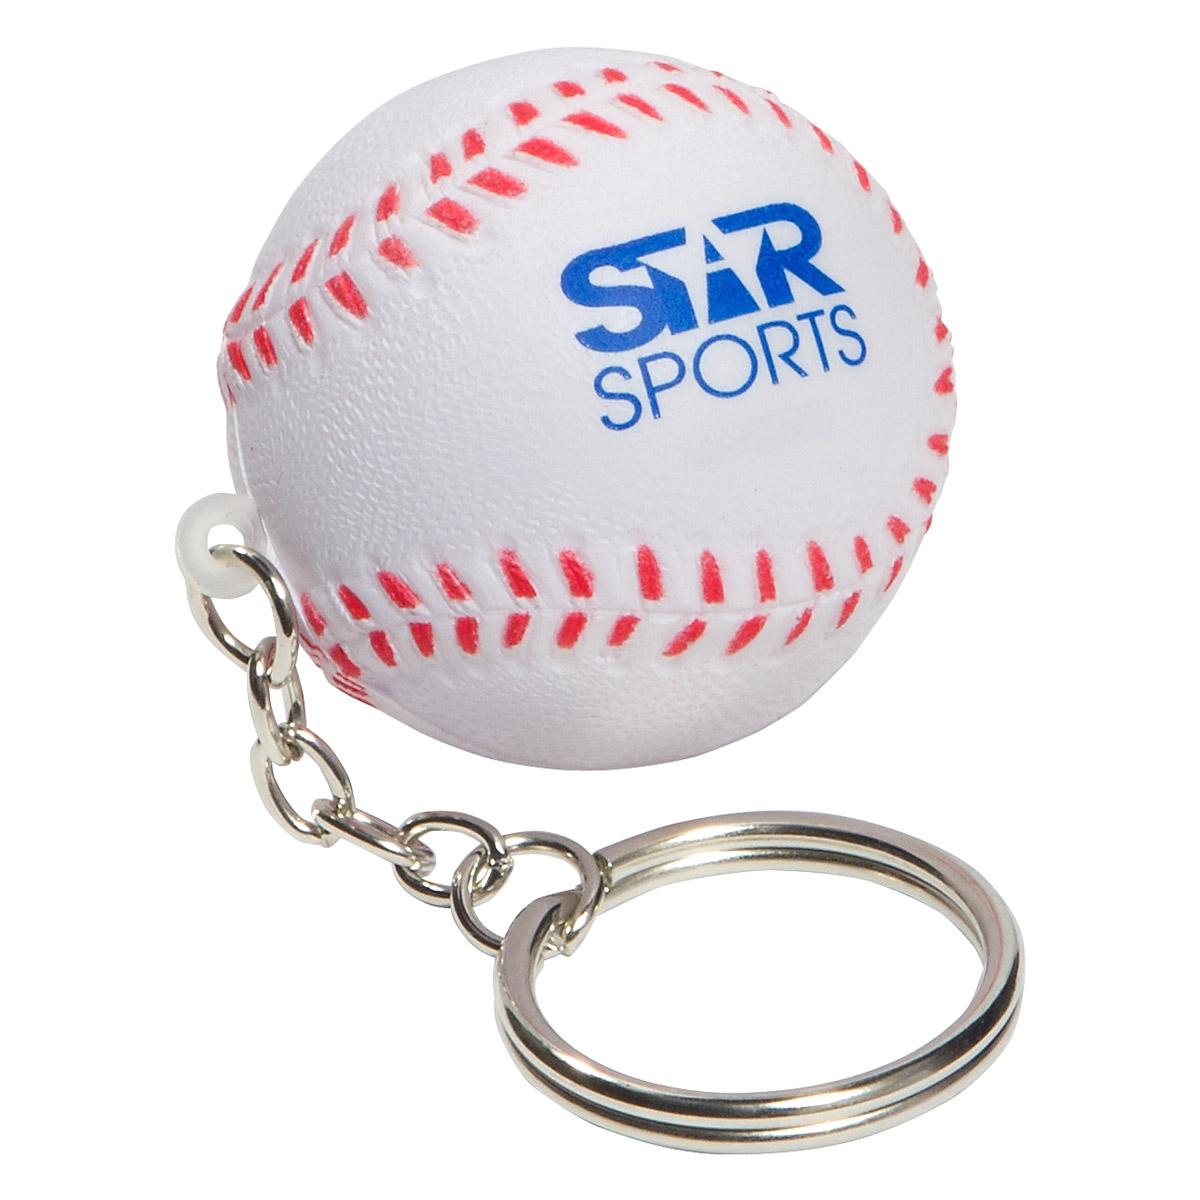 Baseball Stress Reliever Keychain, LKC-BA01 - 1 Colour Imprint